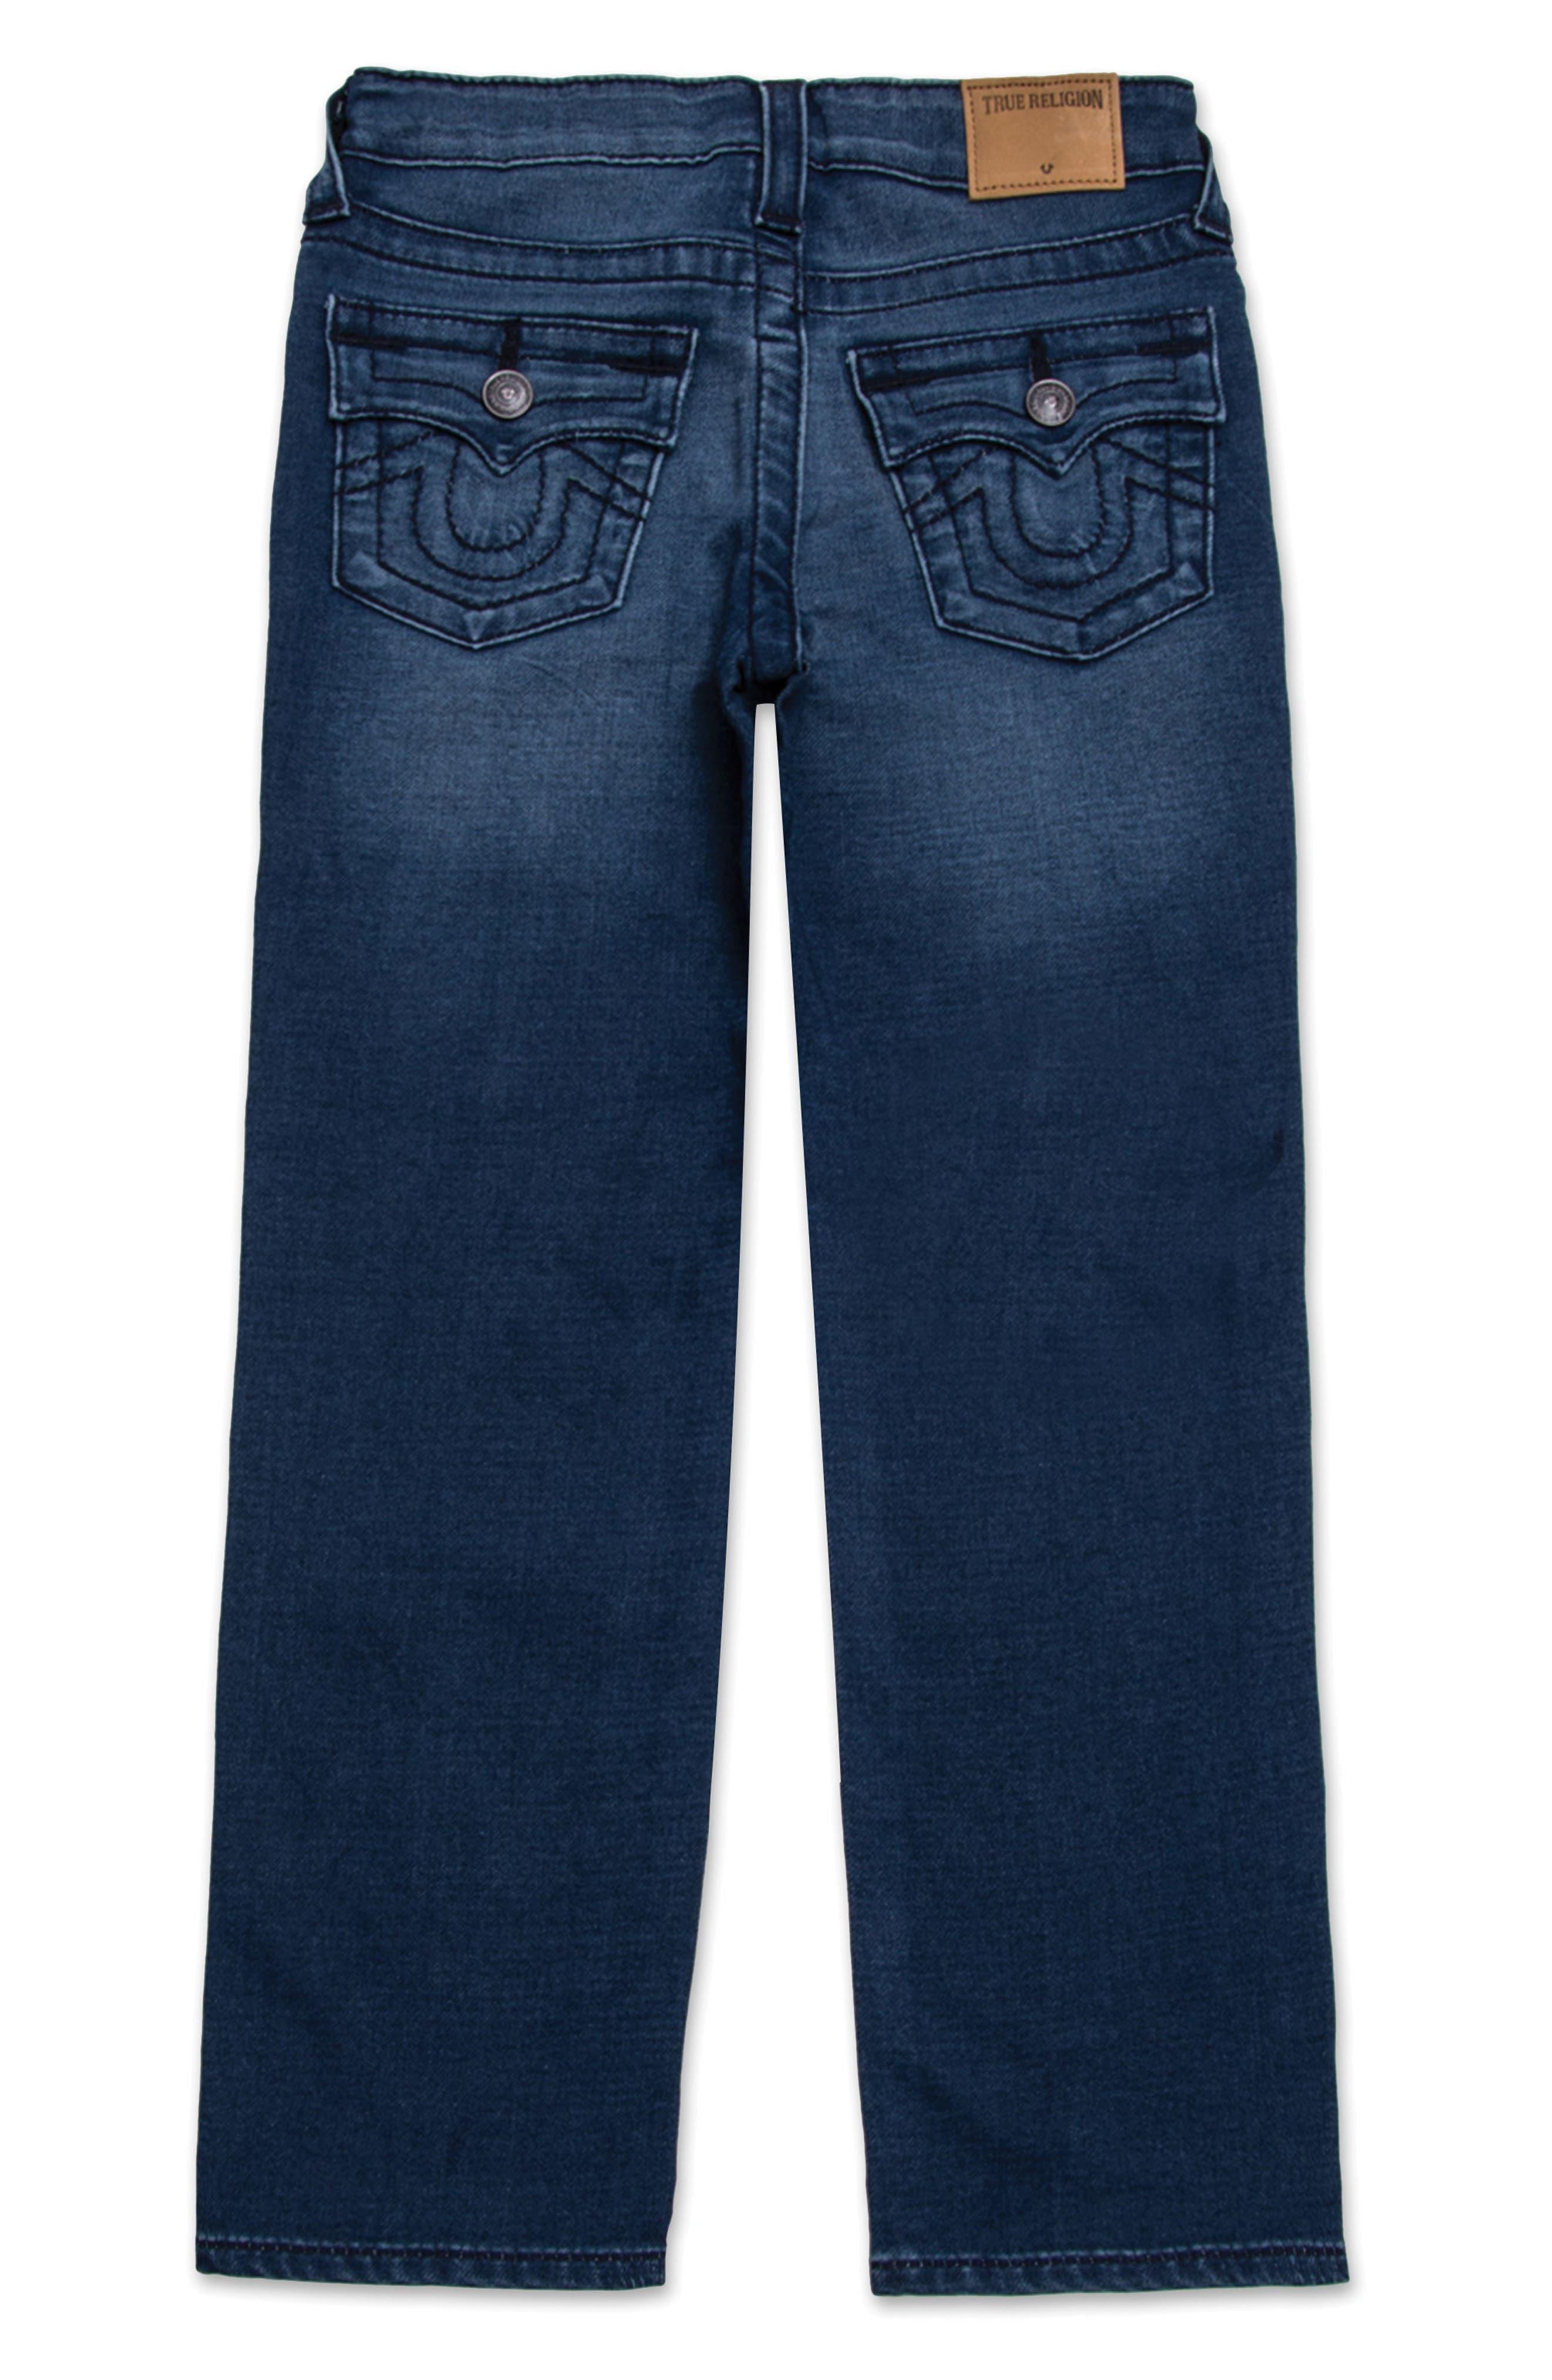 Image of True Religion Geno Single End Jean